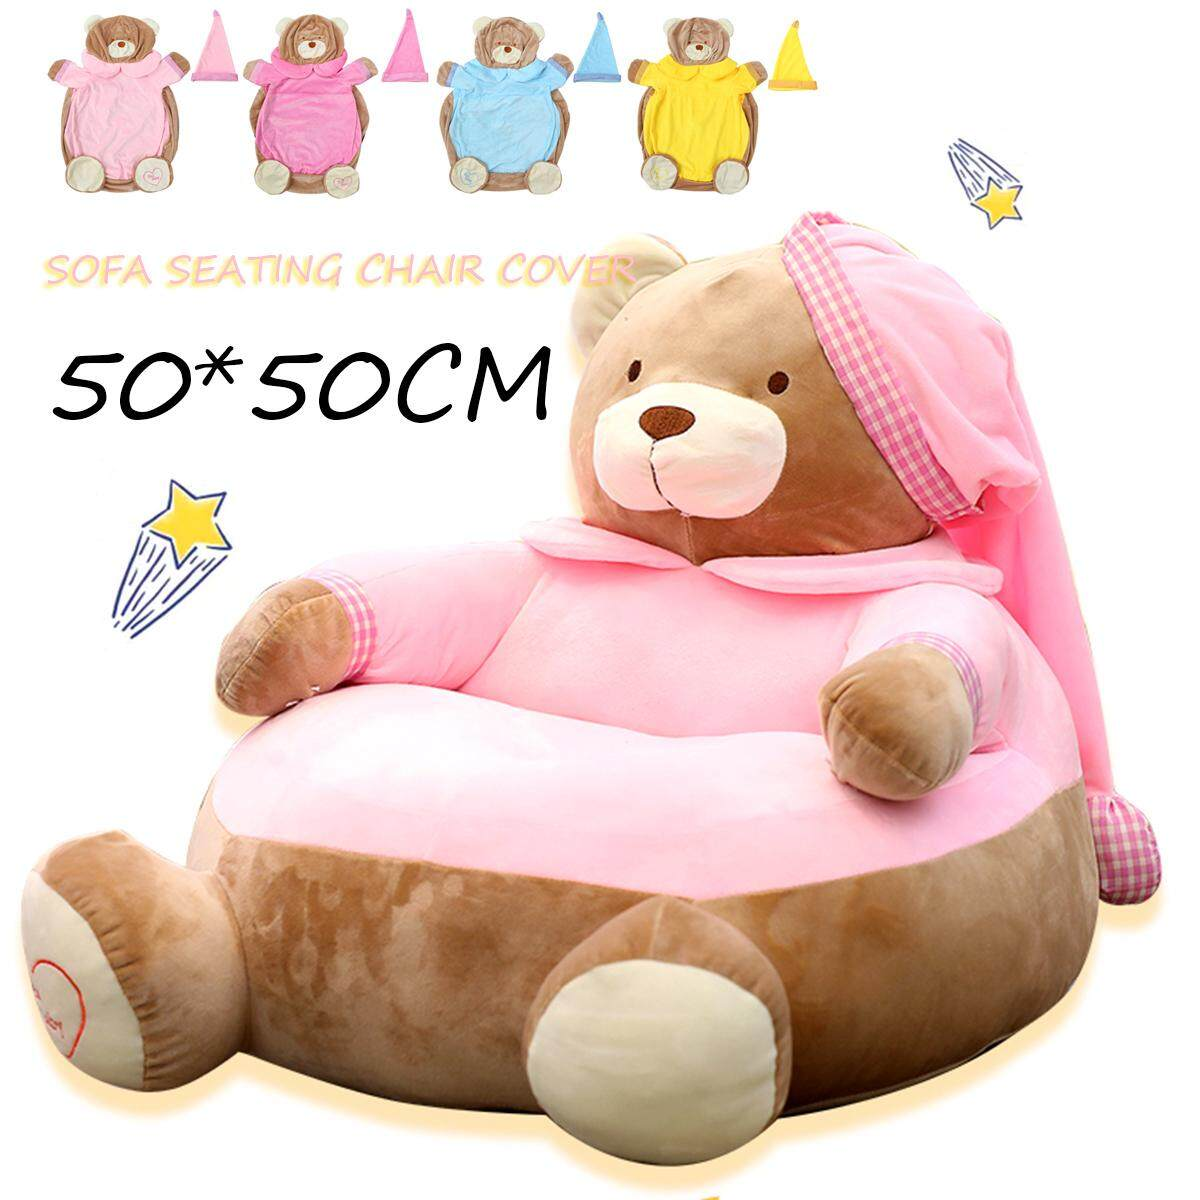 Anak-anak Santai Tempat Duduk Sofa Sarung Kursi Hanya Malas Bean Bag Mebel Bayi